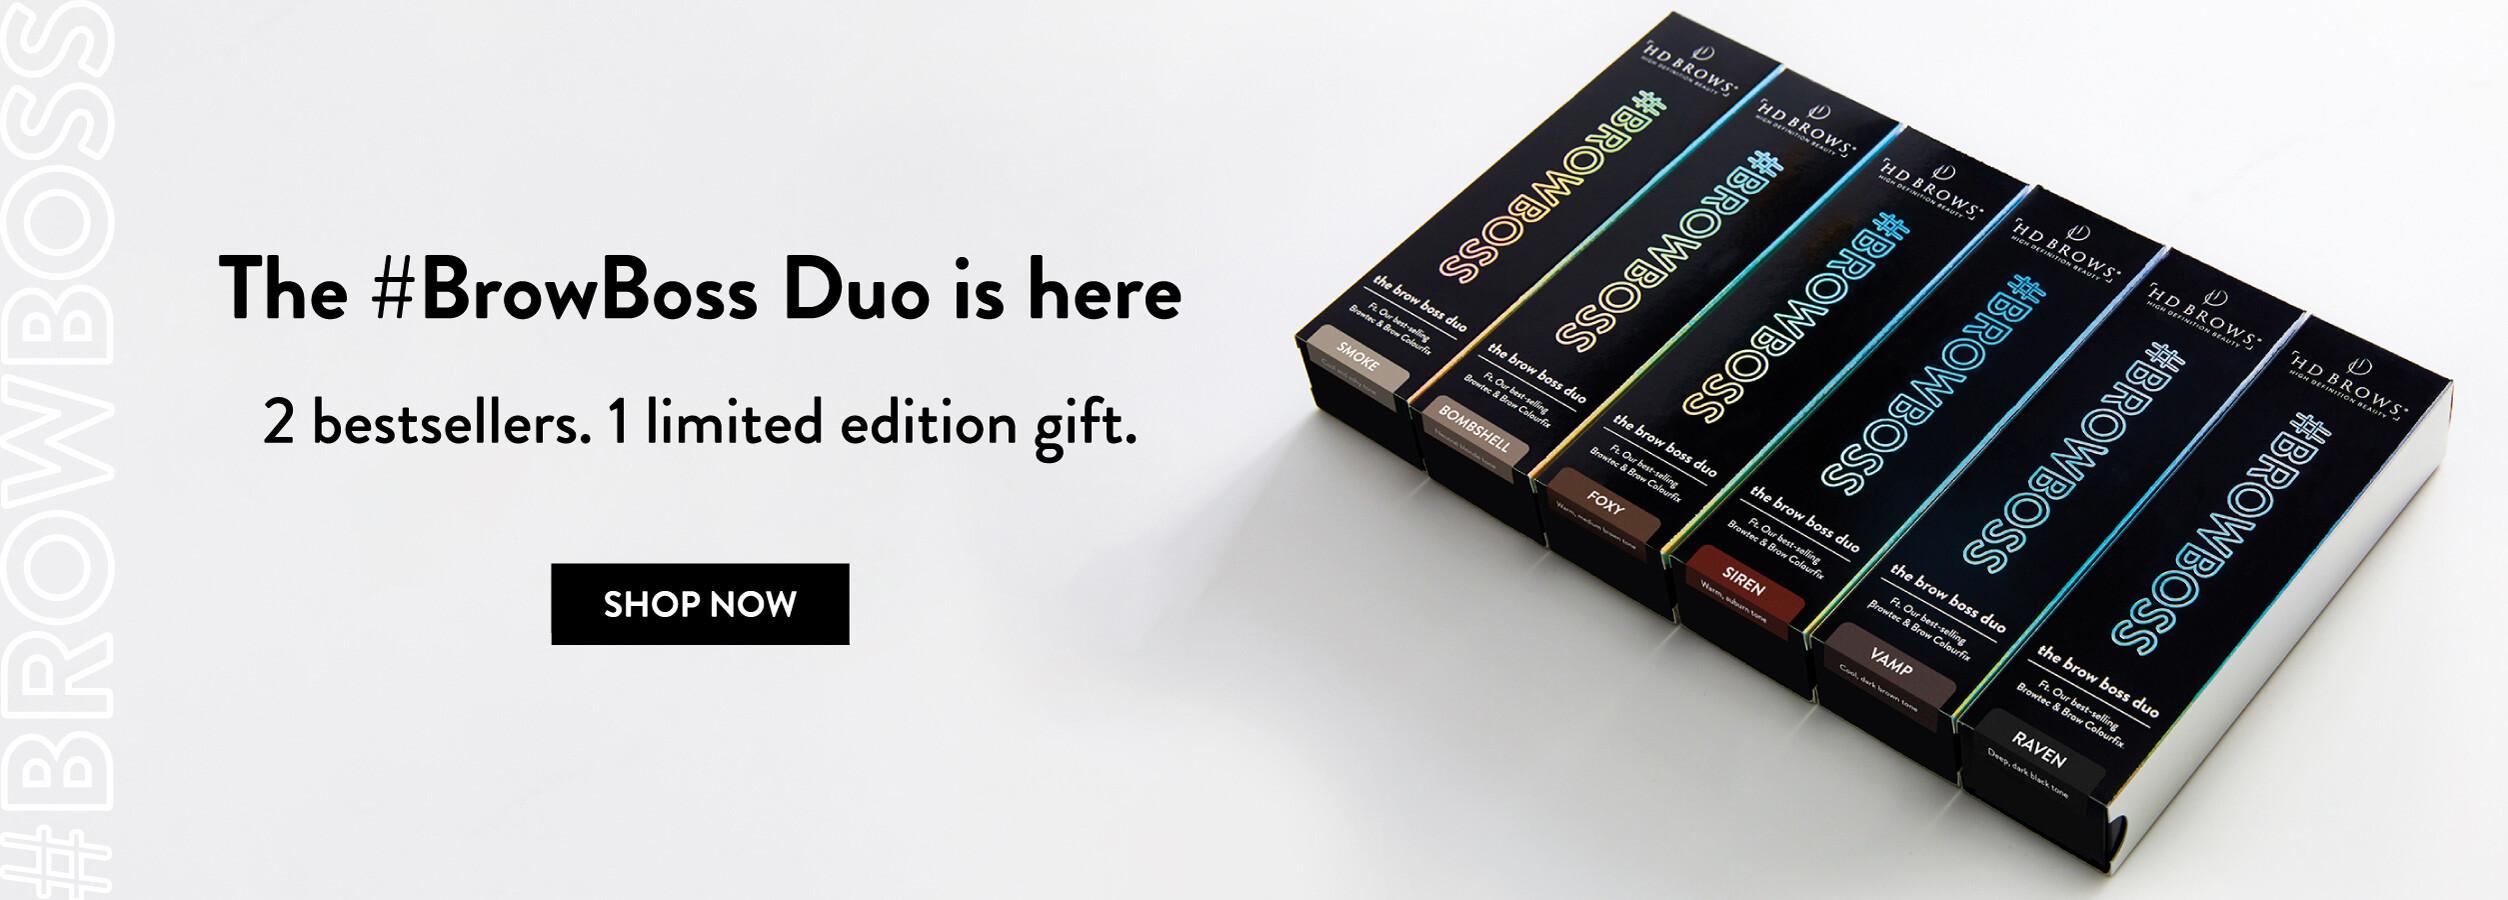 HD Brows Brow Boss Duo